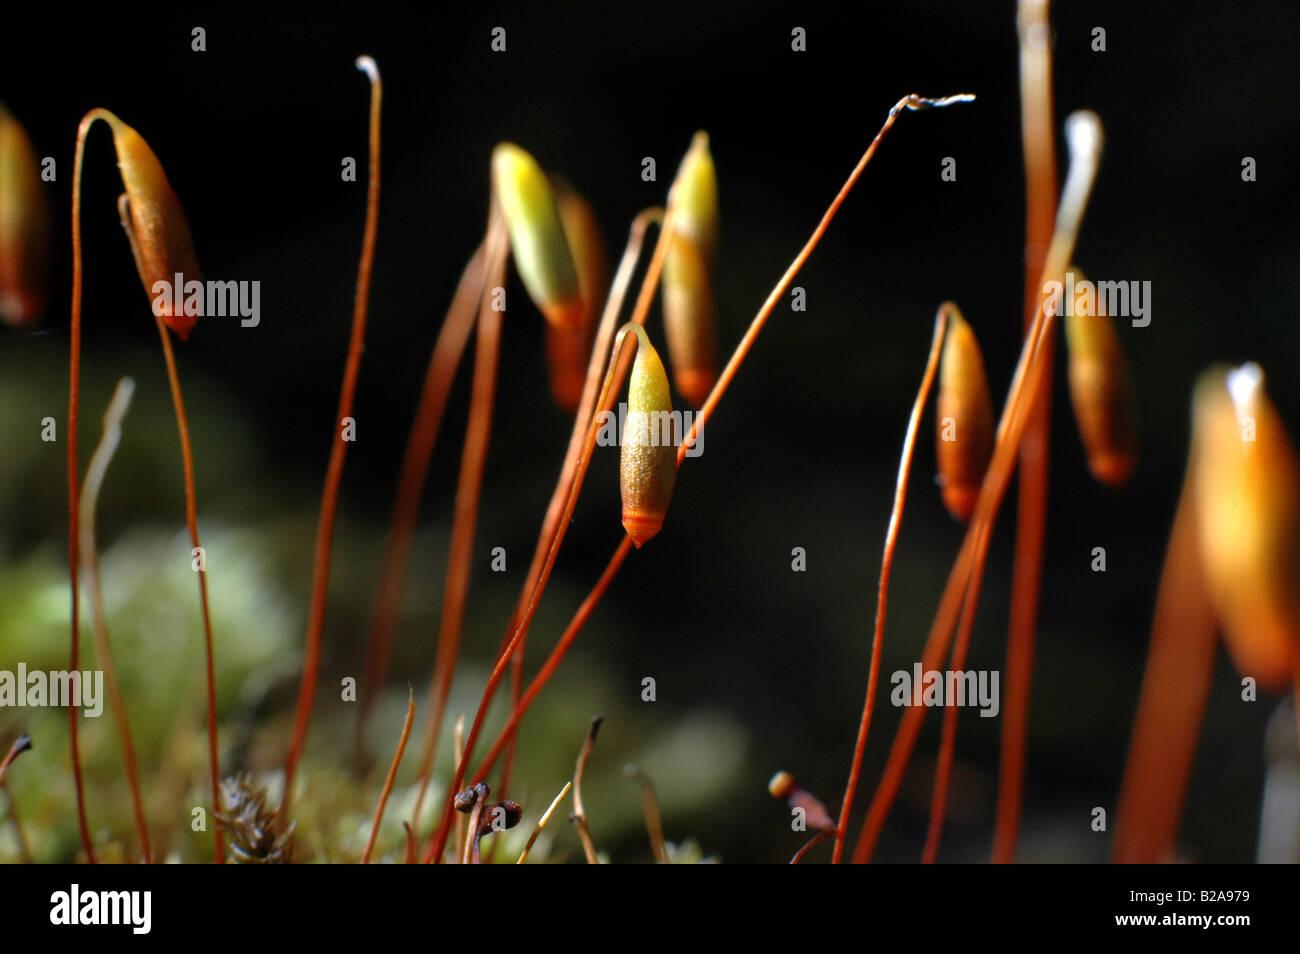 Prächtig Moossporen Stockfotos & Moossporen Bilder - Alamy #YD_66